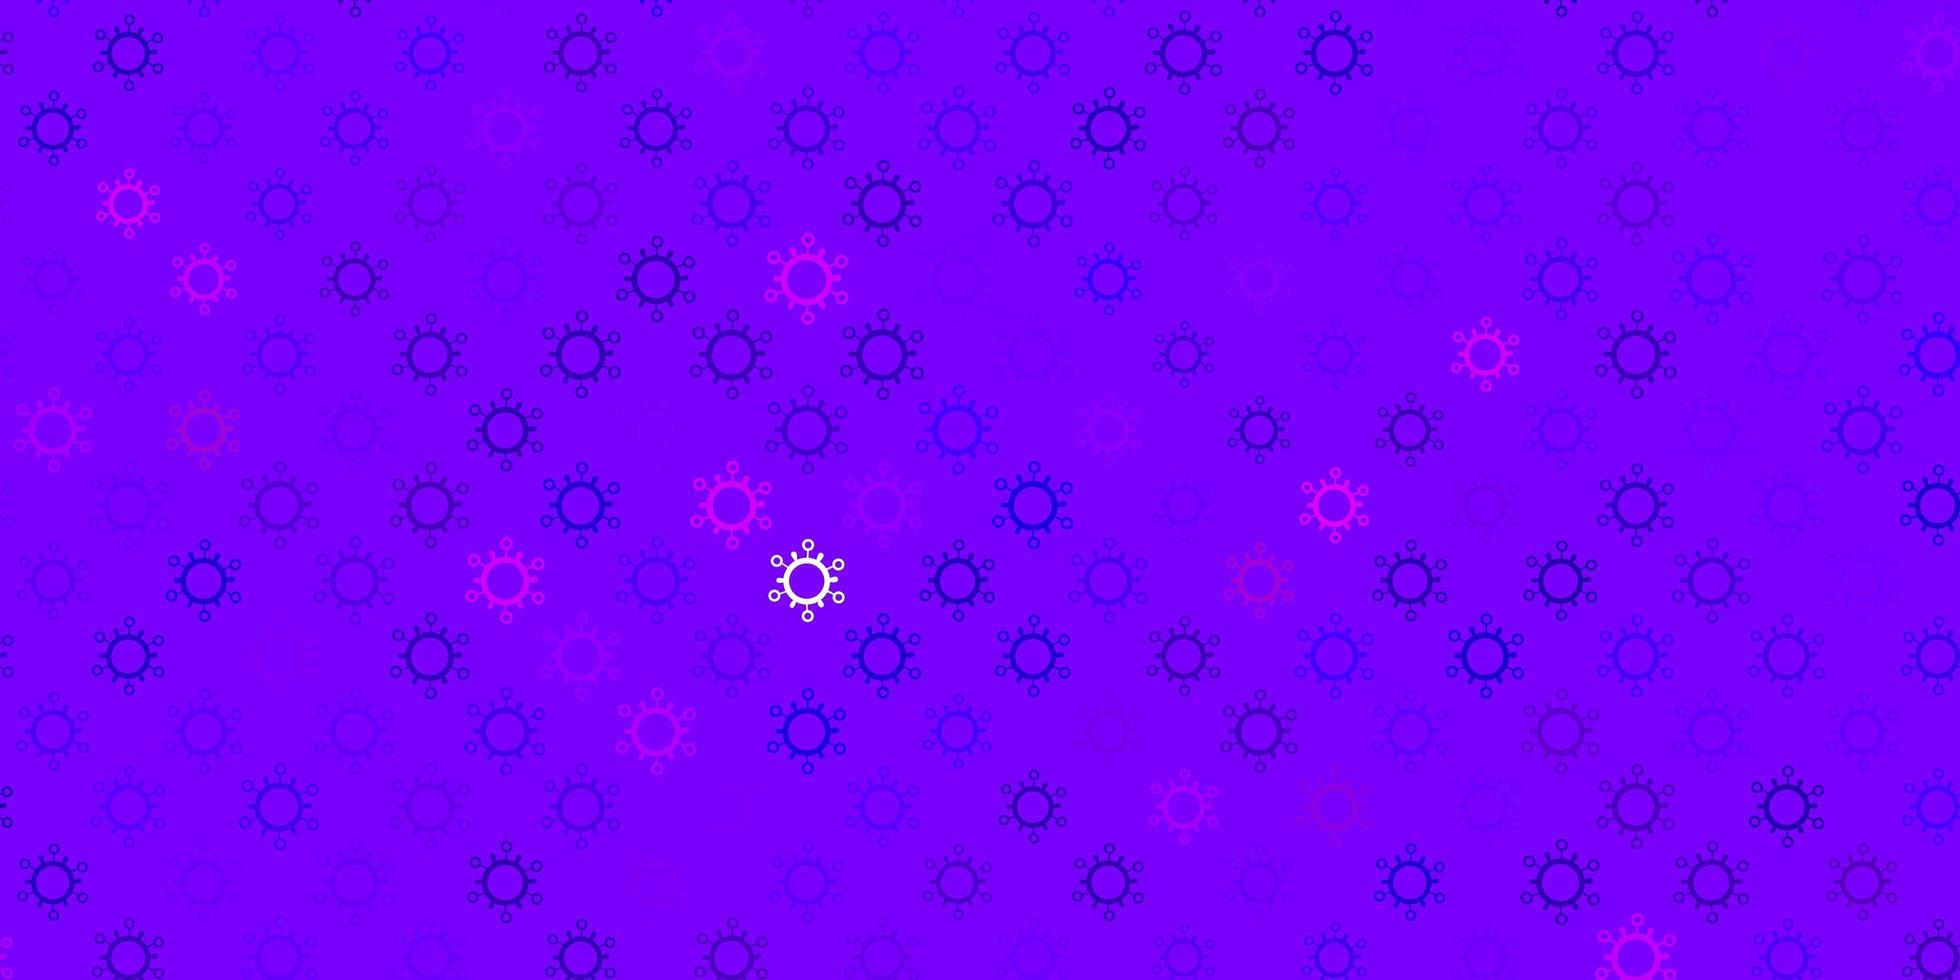 Fondo de vector violeta oscuro, rosa con símbolos covid-19